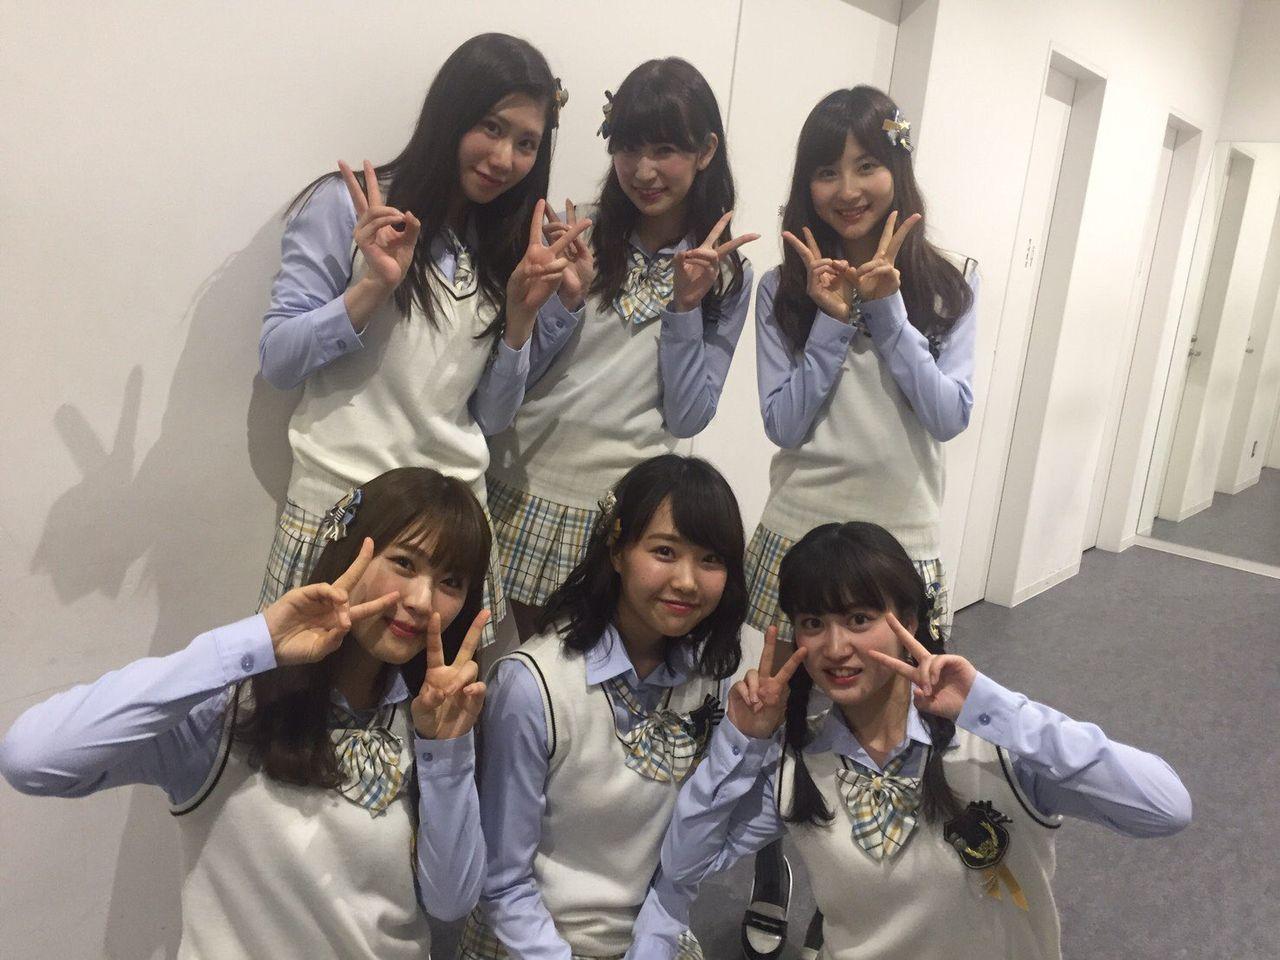 【KawaiianTV】『夜方NMB48』出演者全員キレキレwゆうみん切れ味鋭すぎwwww